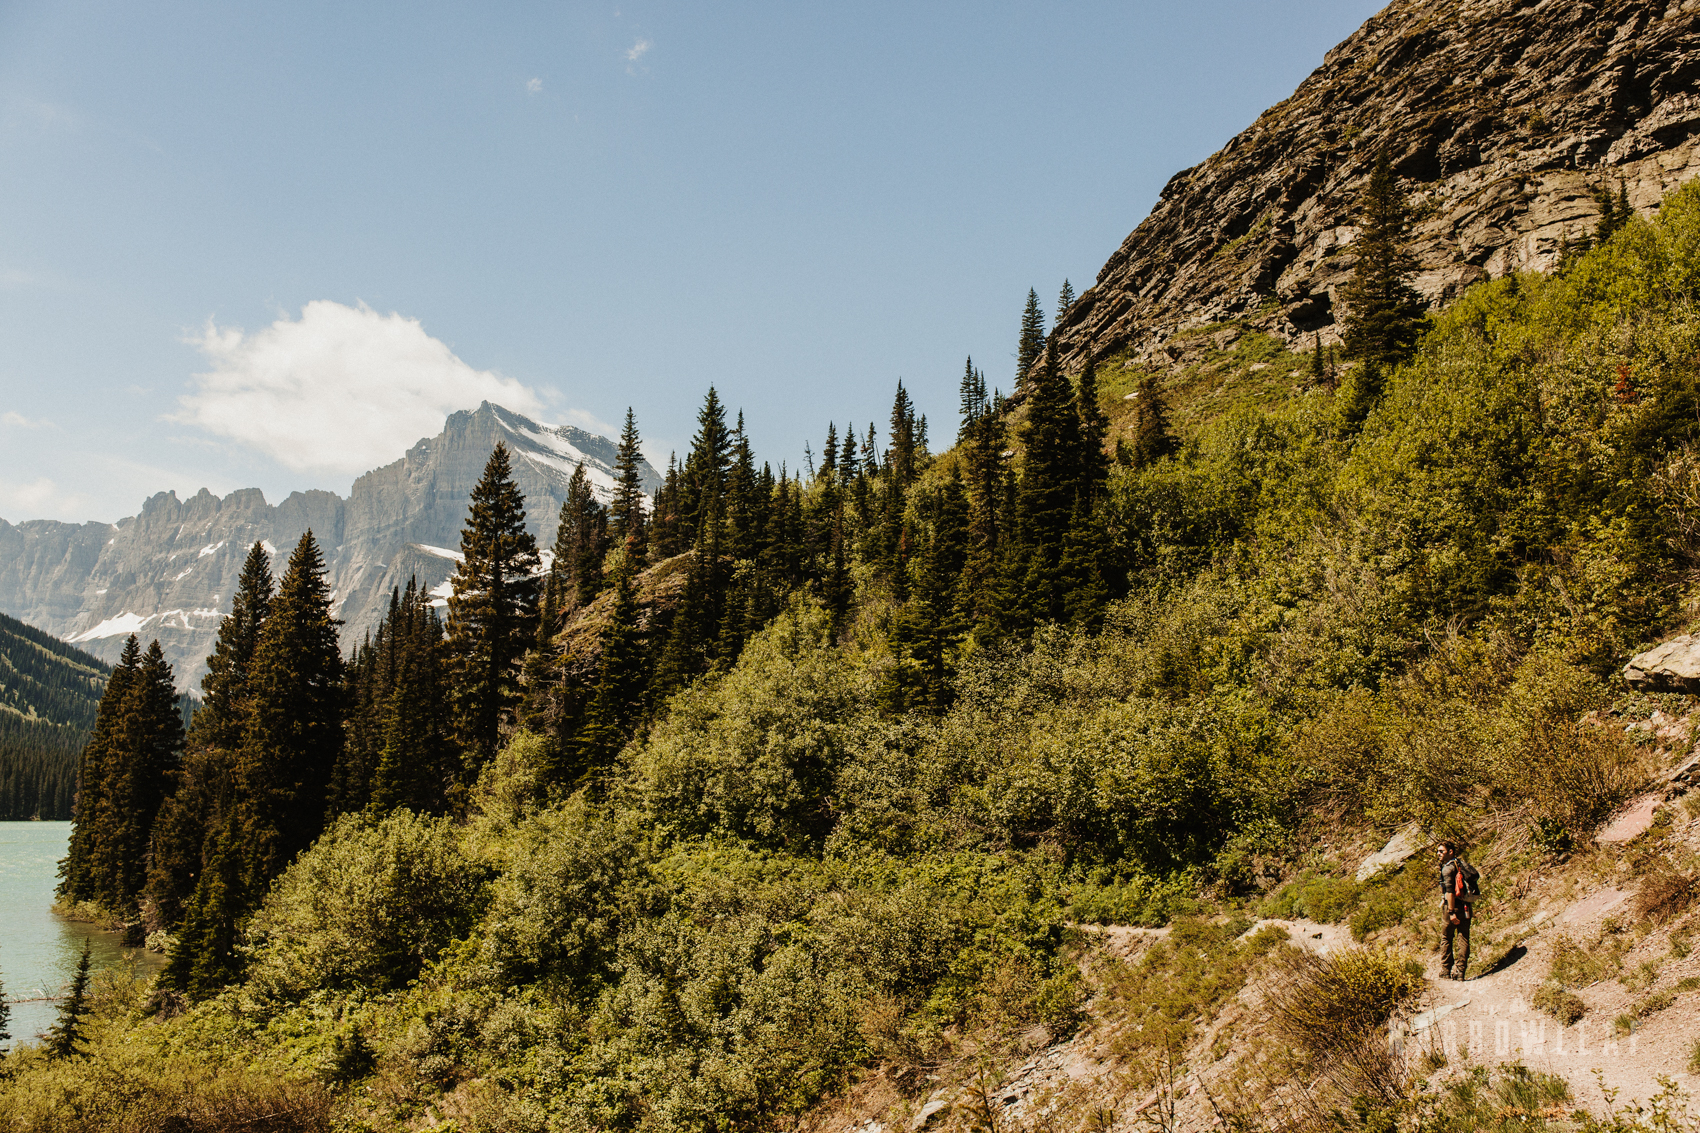 Montana-Glacier-National-Park-Many-Glacier-Narrowleaf-Love-and-Adventure-elopement-Photography-9424.jpg